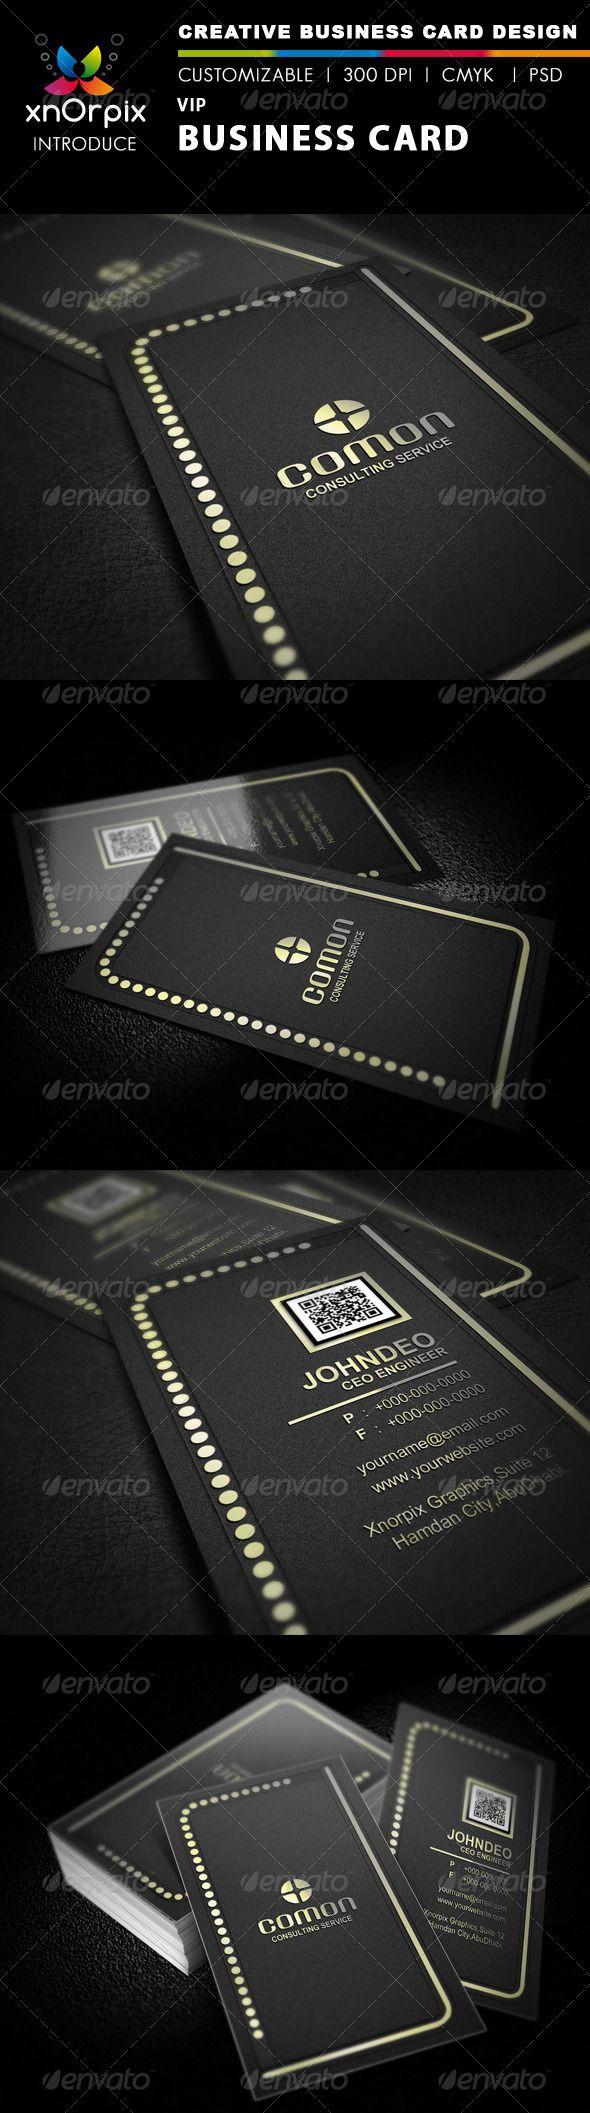 Vip business card vip business cards and business card templates vip business reheart Choice Image